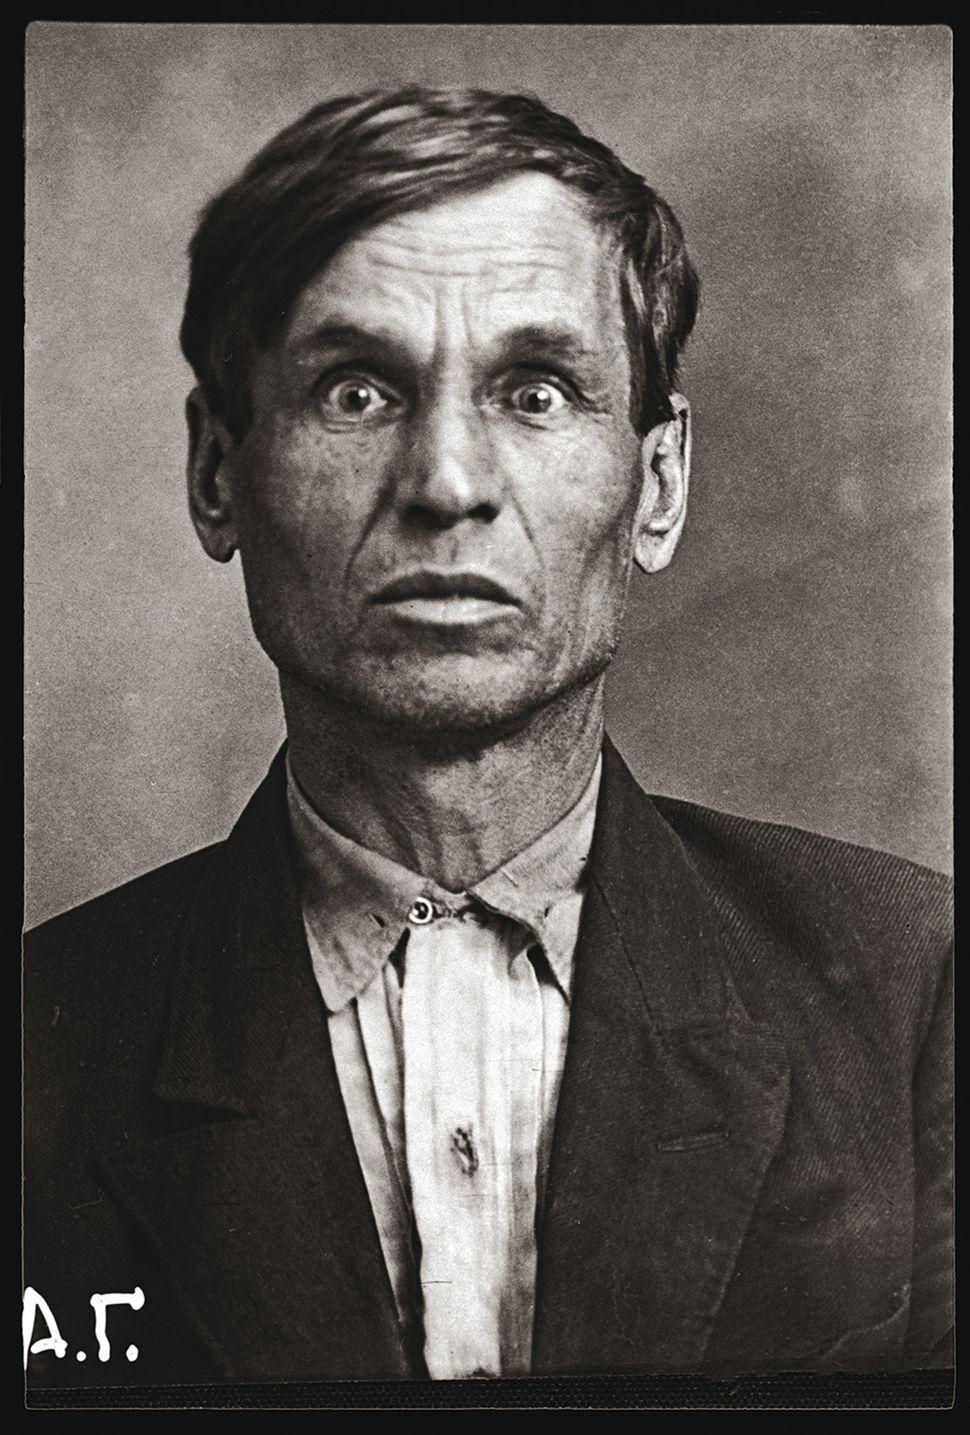 Alekseï Grigorievitch Jeltikov, Russia, born 1890 in the village of Demkino, in the Riazan region. Attended elementary s